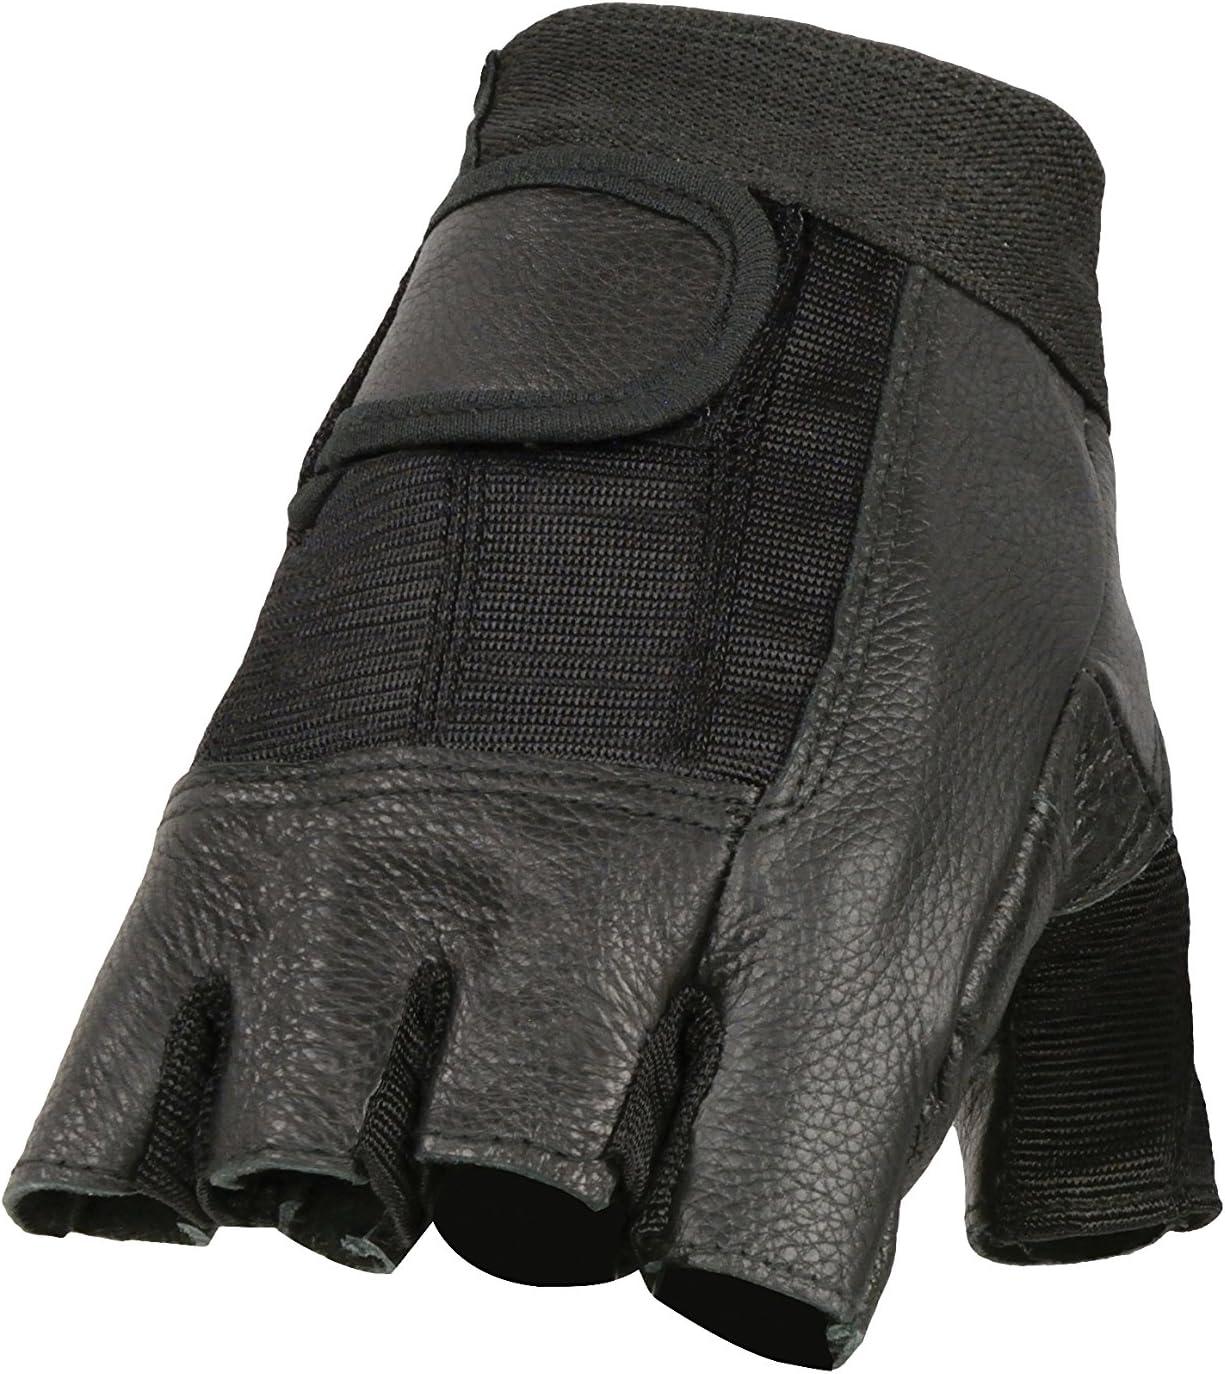 Black, XX-Large Spandex and Leather G Shaf International Mens Fingerless Gloves